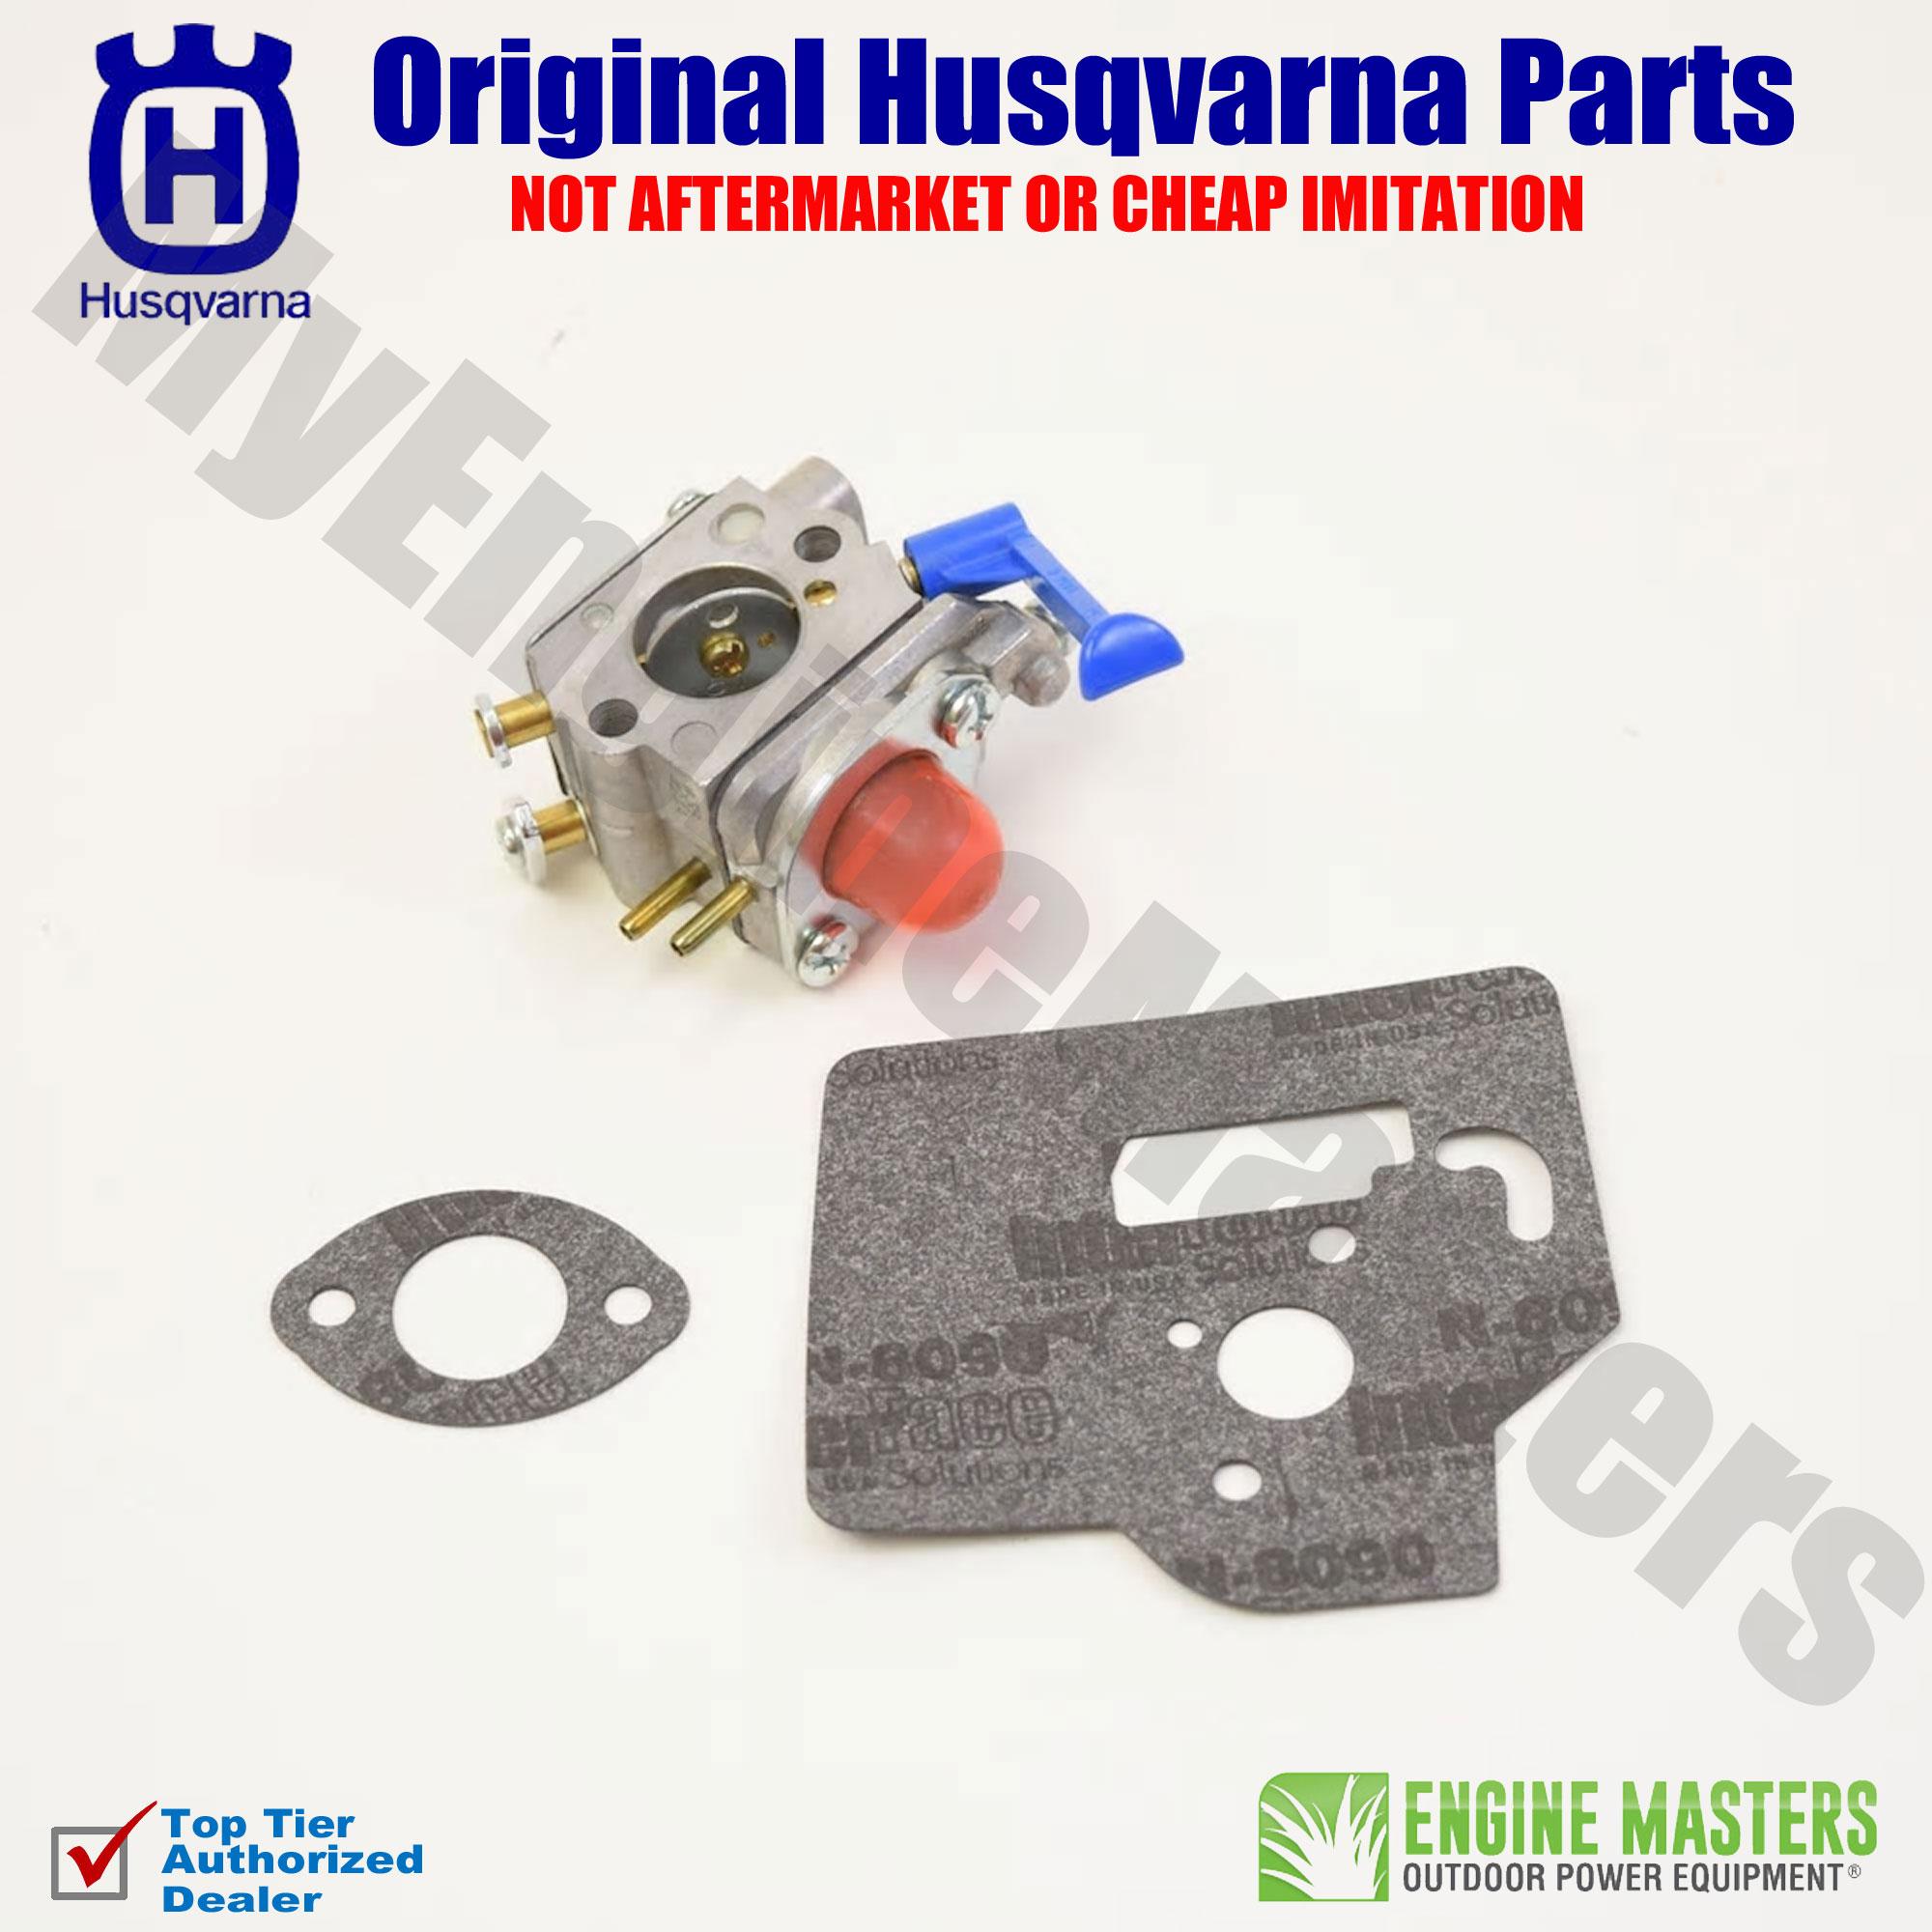 hight resolution of oem husqvarna 545081850 carburetor 125ldx 124c 128ld 124l gc2126 125l 125e w38